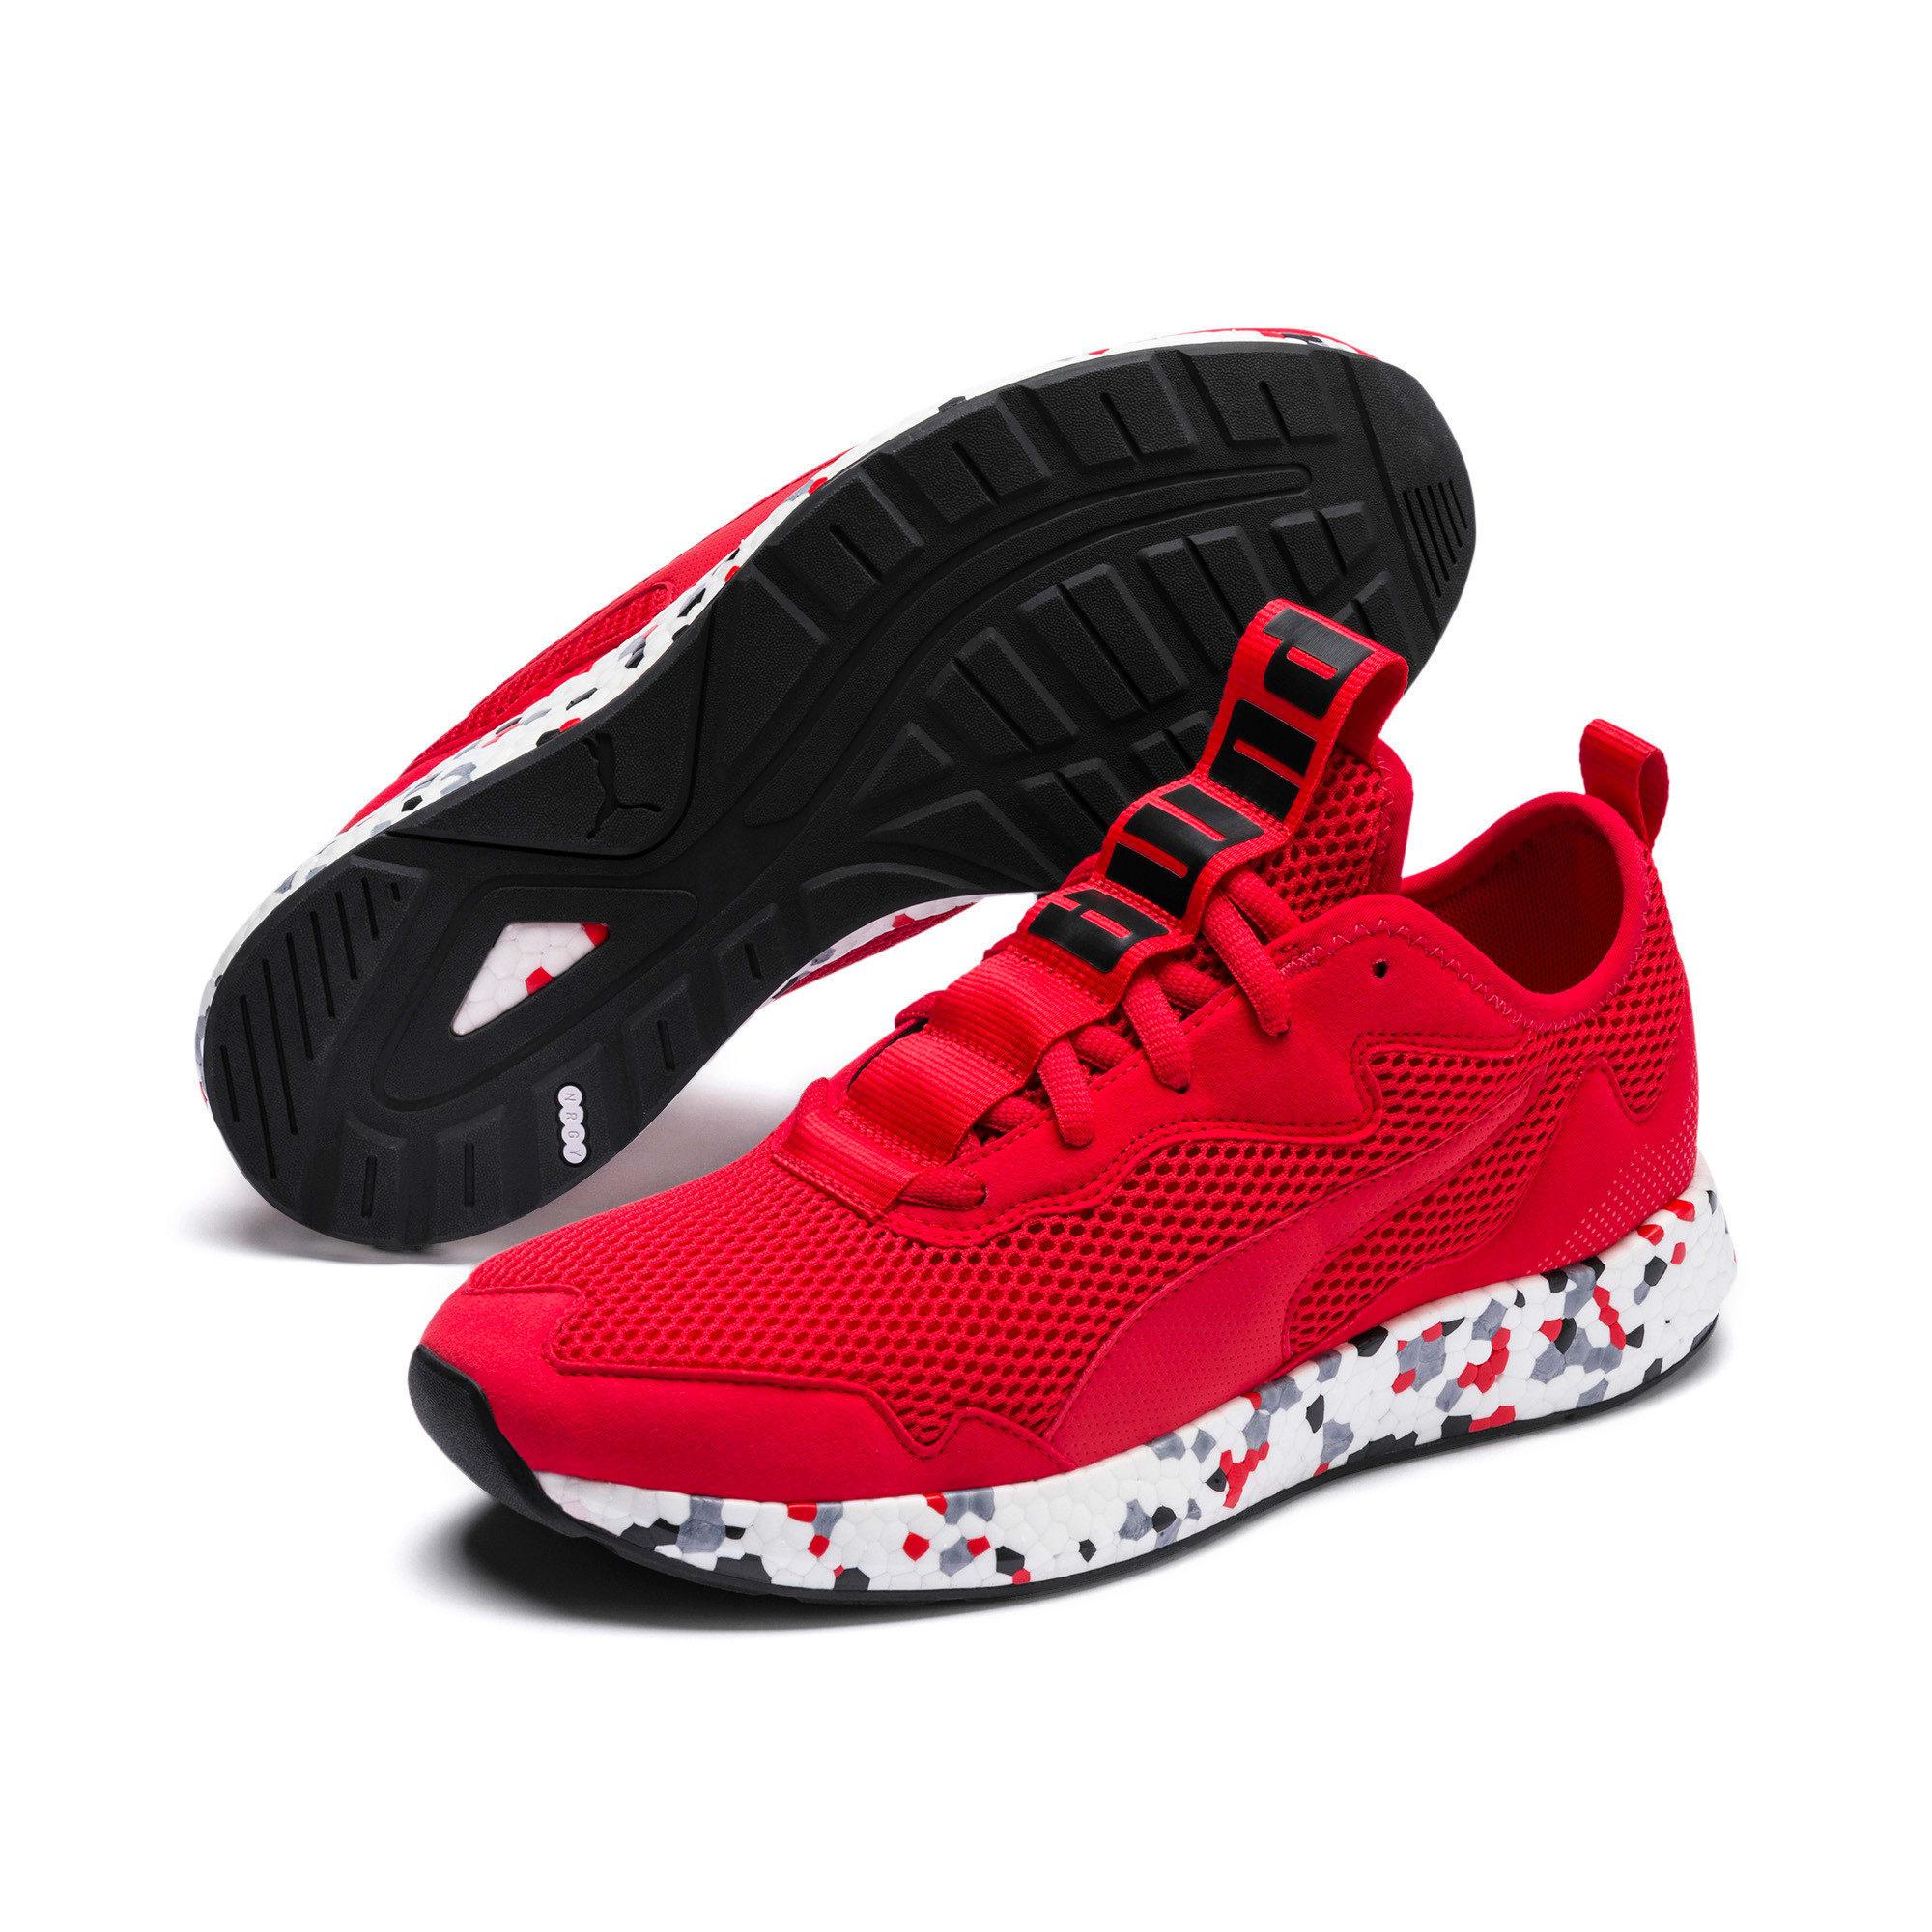 Thumbnail 8 of NRGY Neko Skim Men's Running Shoes, High Risk Red-Puma Black, medium-IND